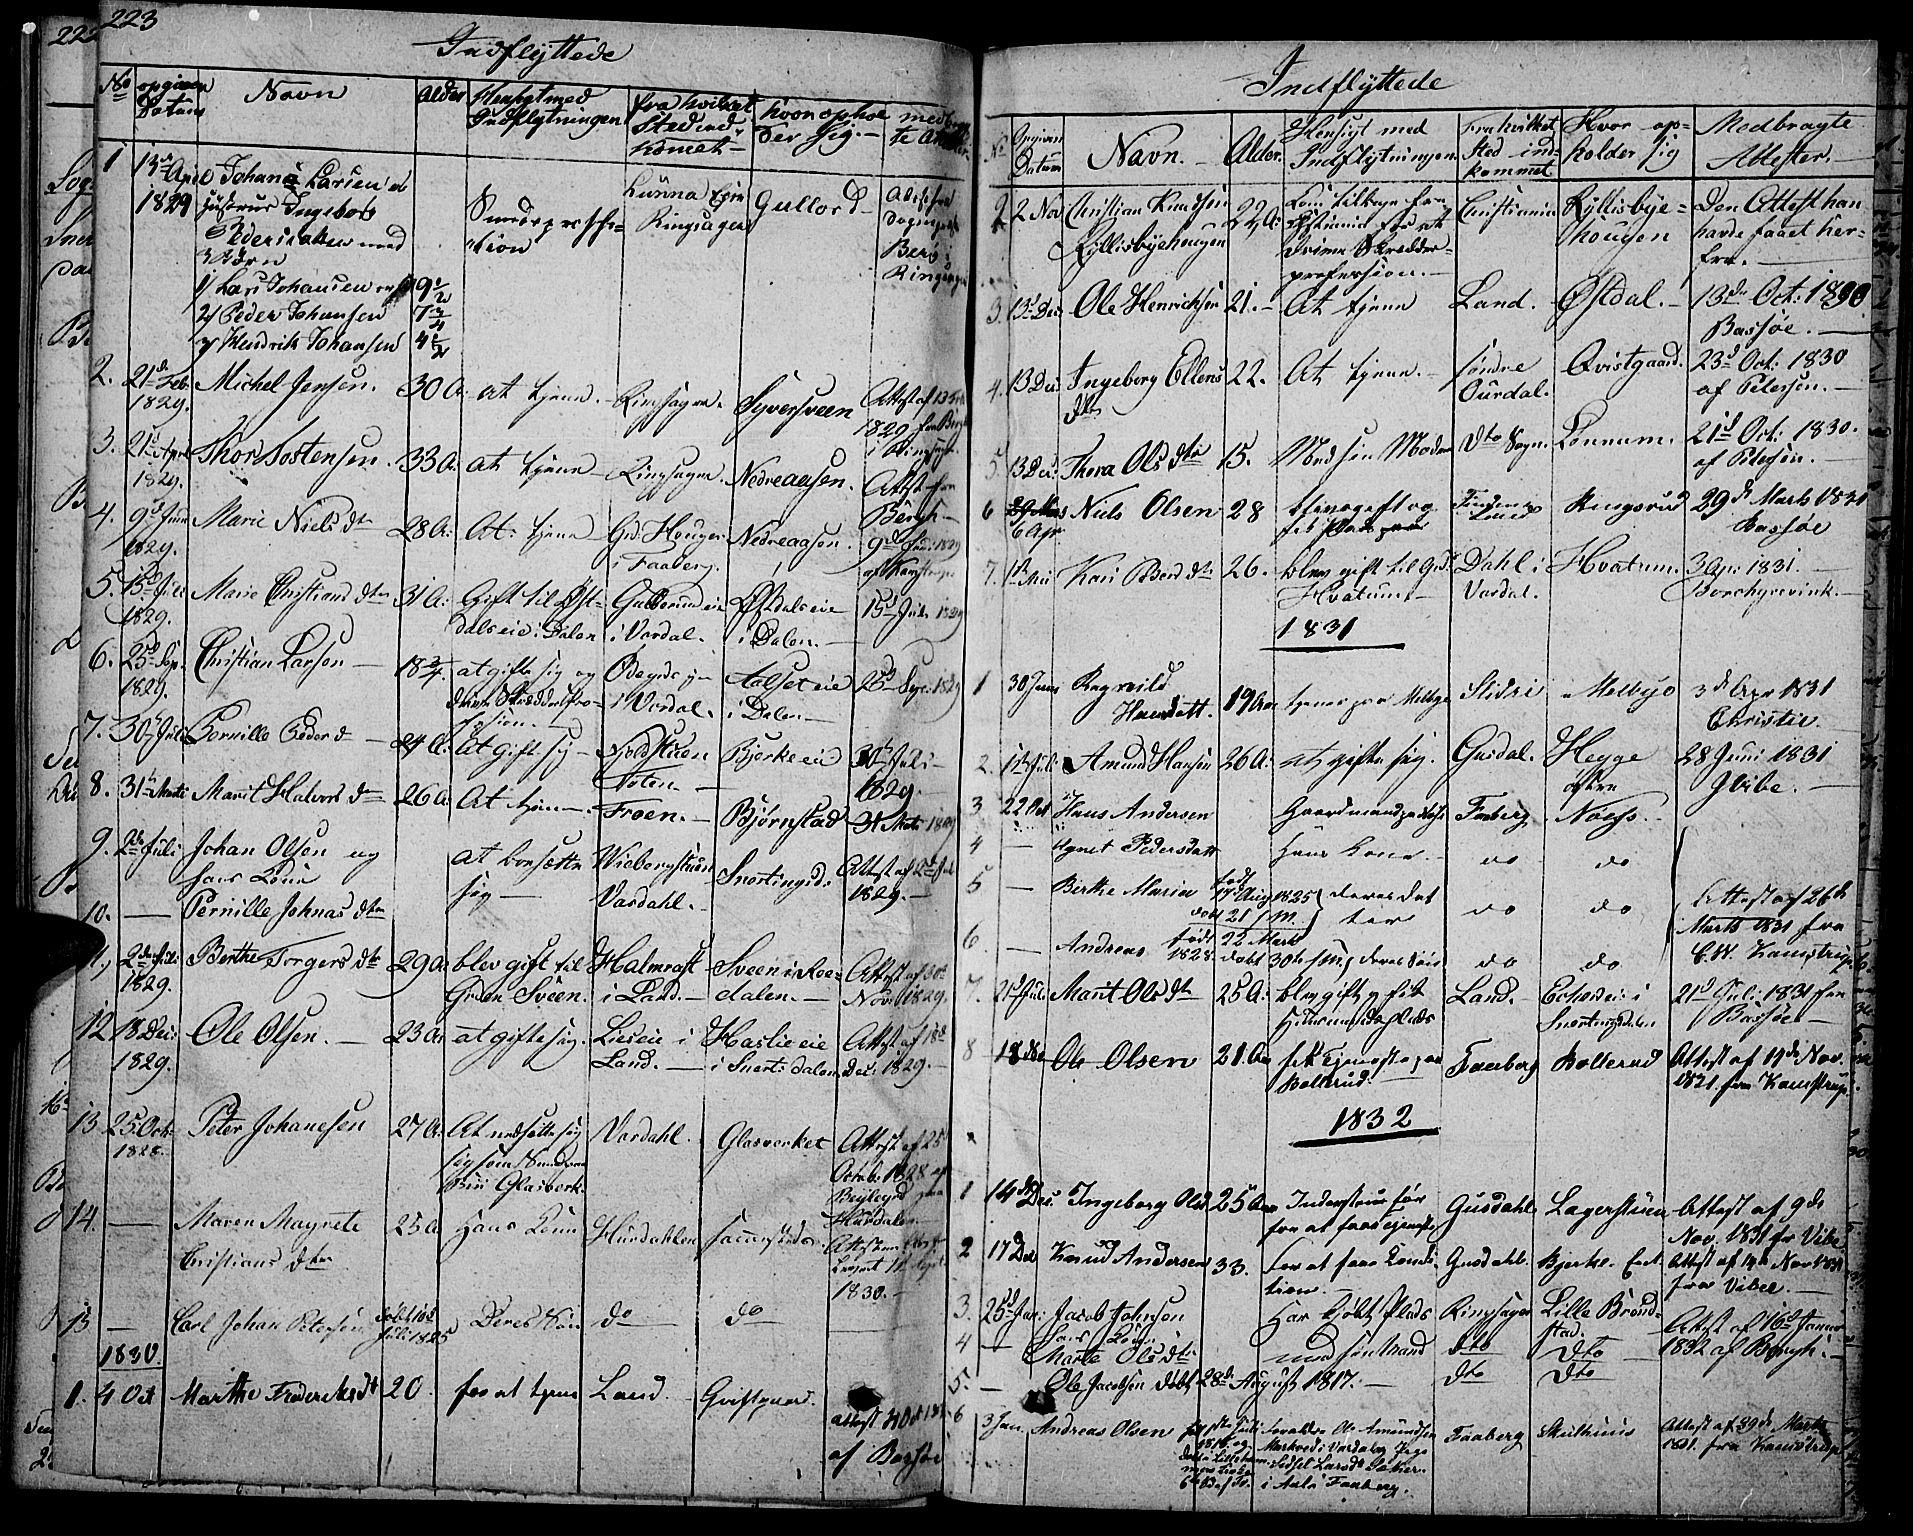 SAH, Biri prestekontor, Ministerialbok nr. 4, 1829-1842, s. 223